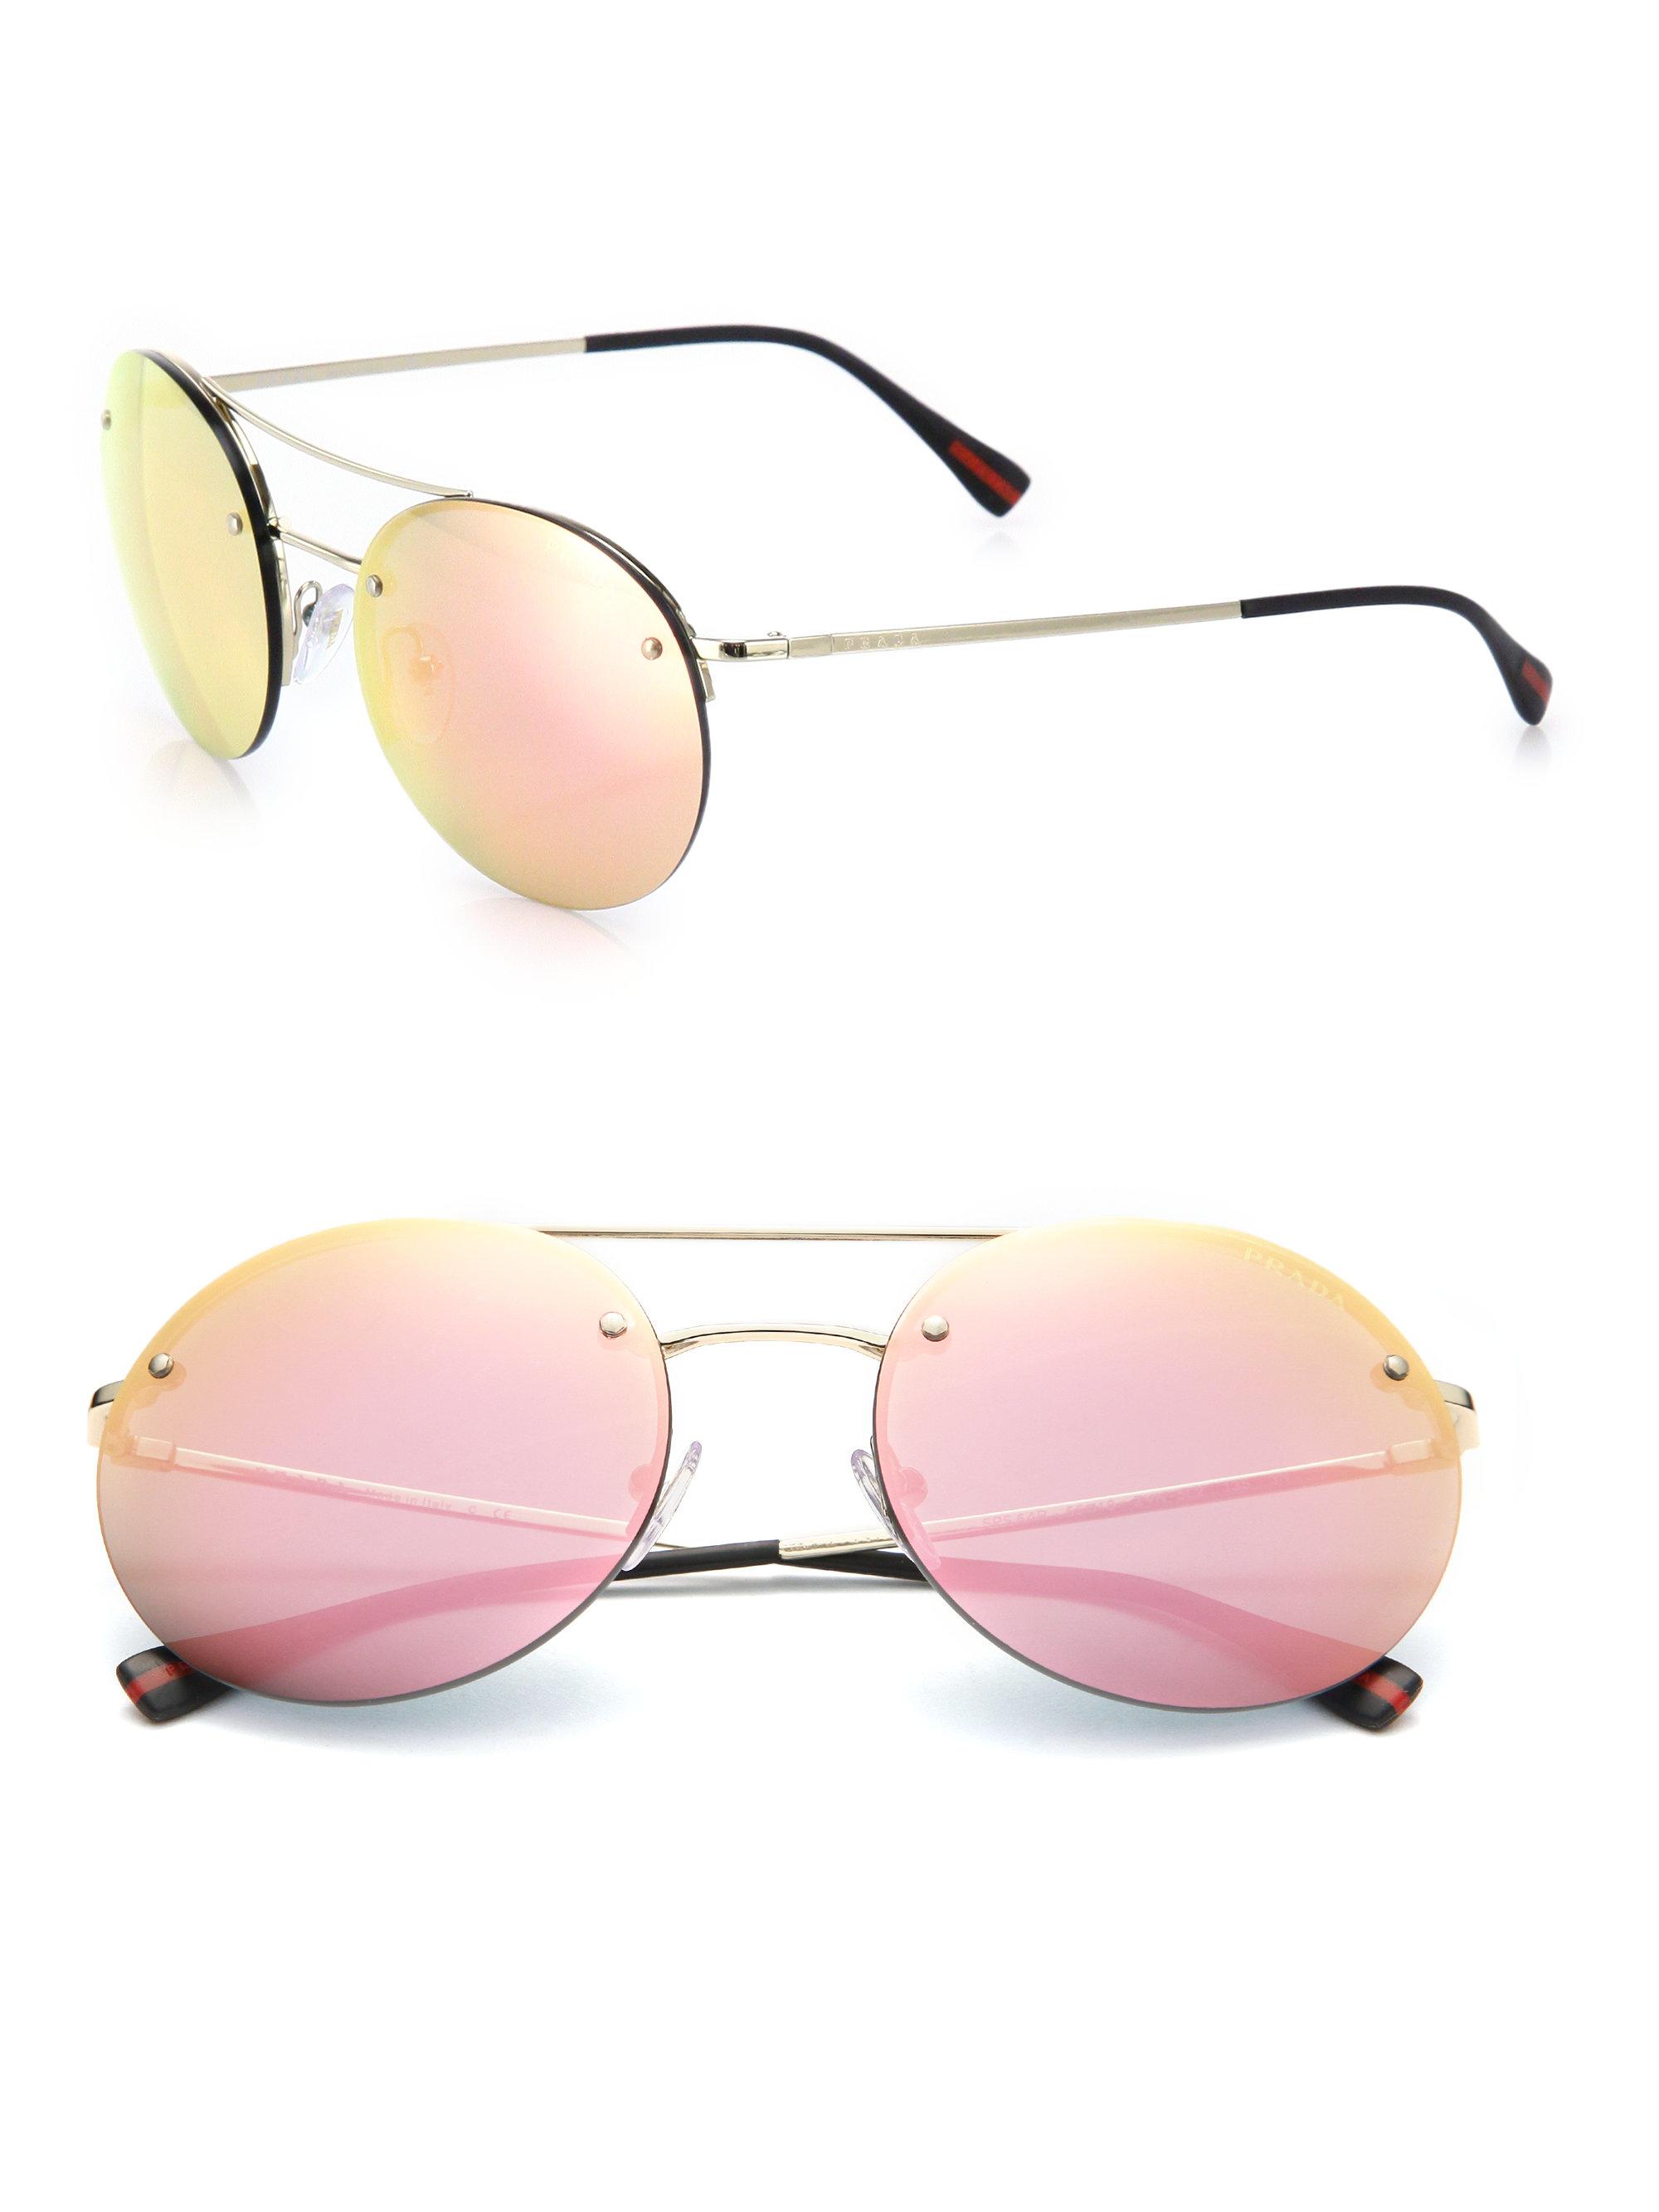 Prada Rounded Aviator Sunglasses | Louisiana Bucket Brigade